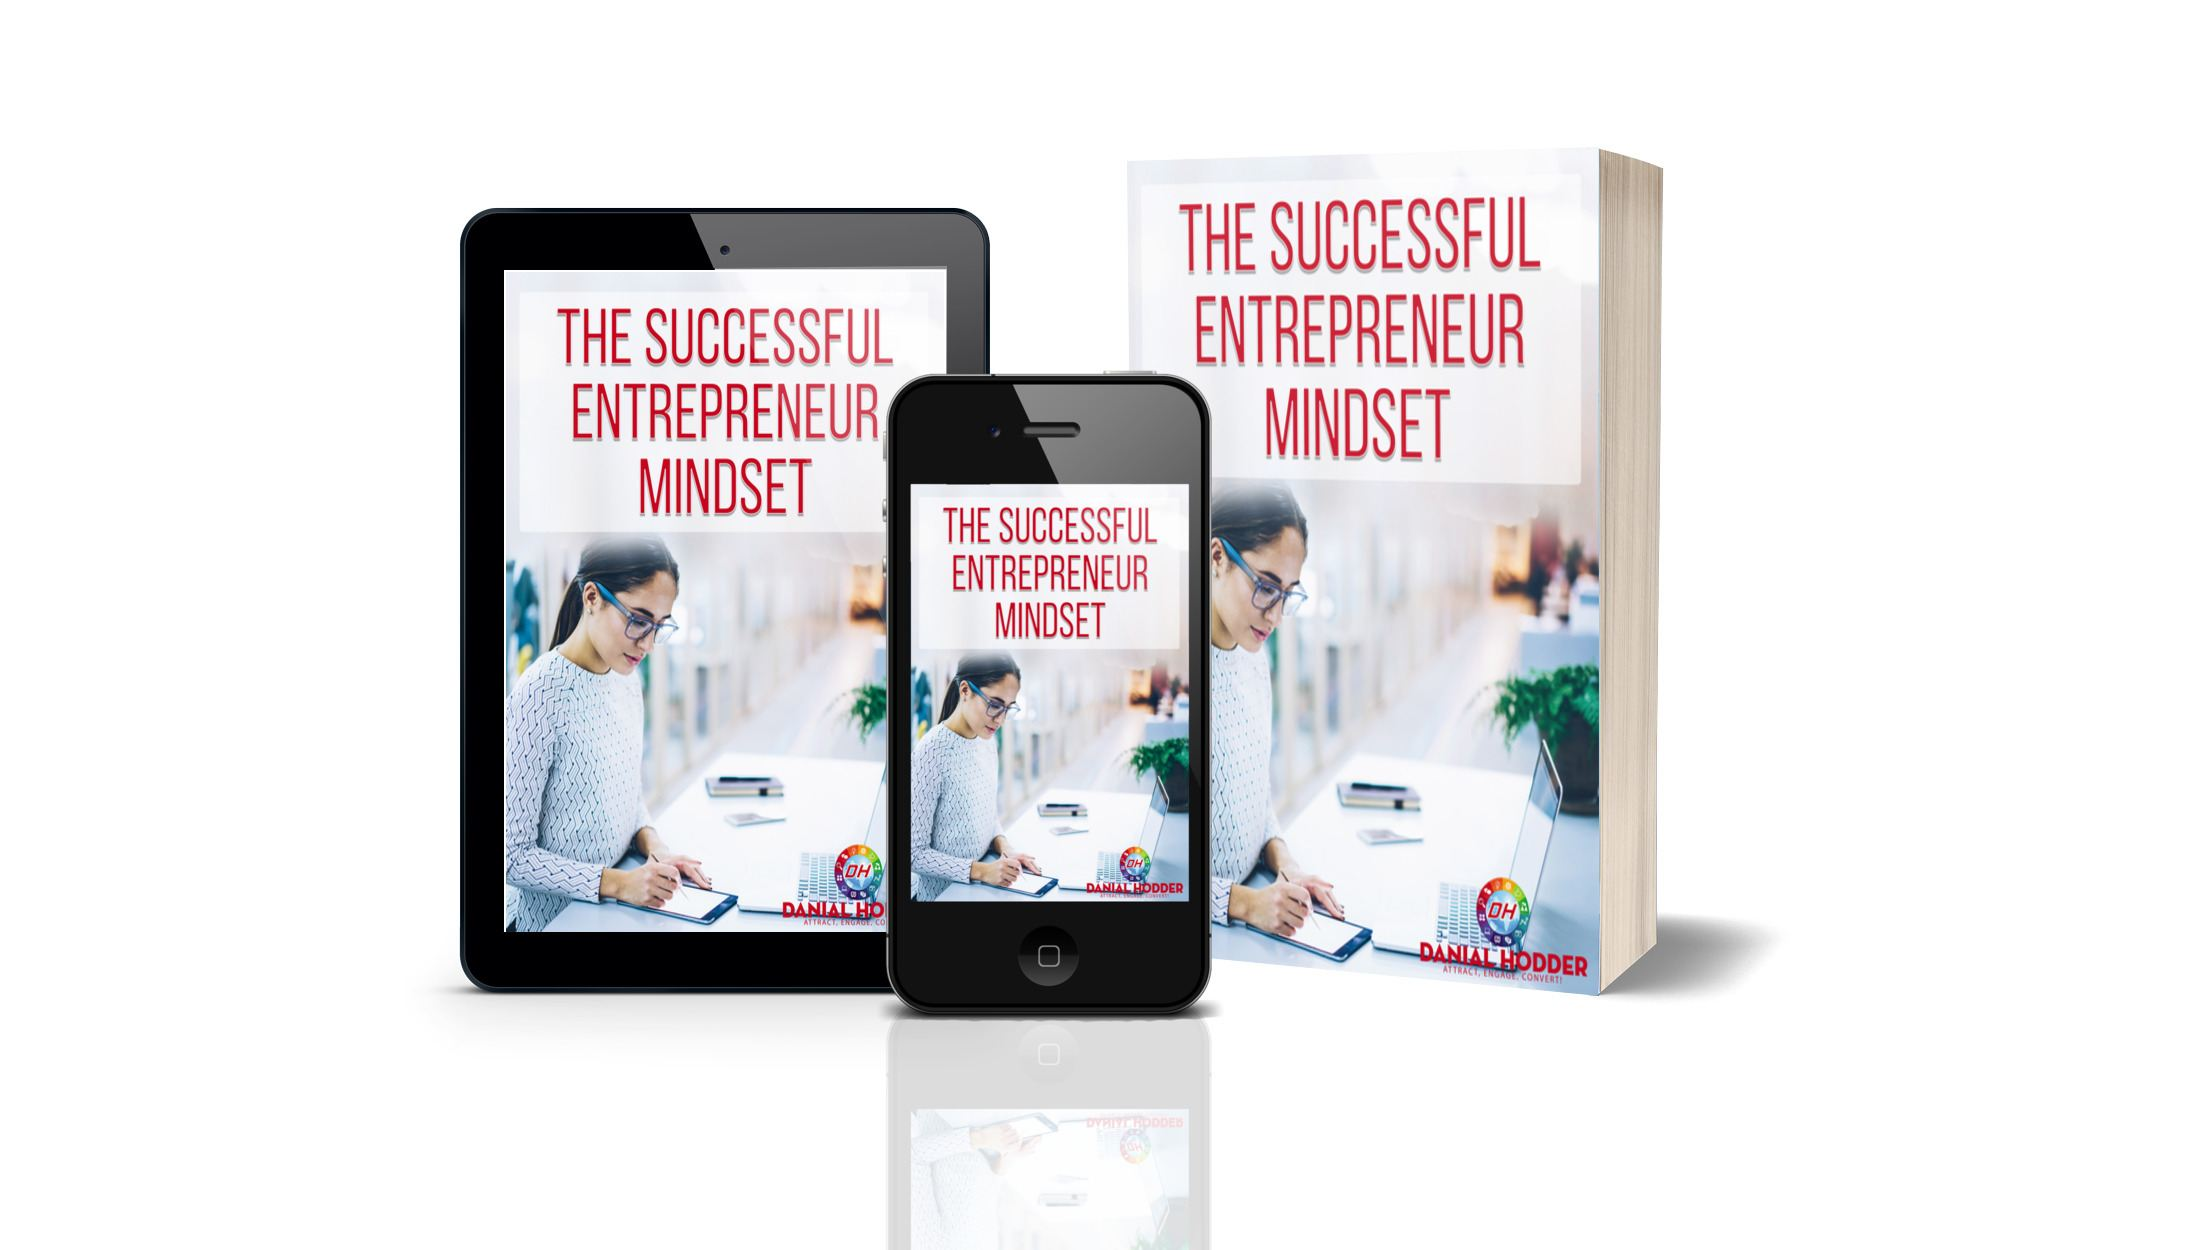 Danial Hodder Successful entrepreneur mindset